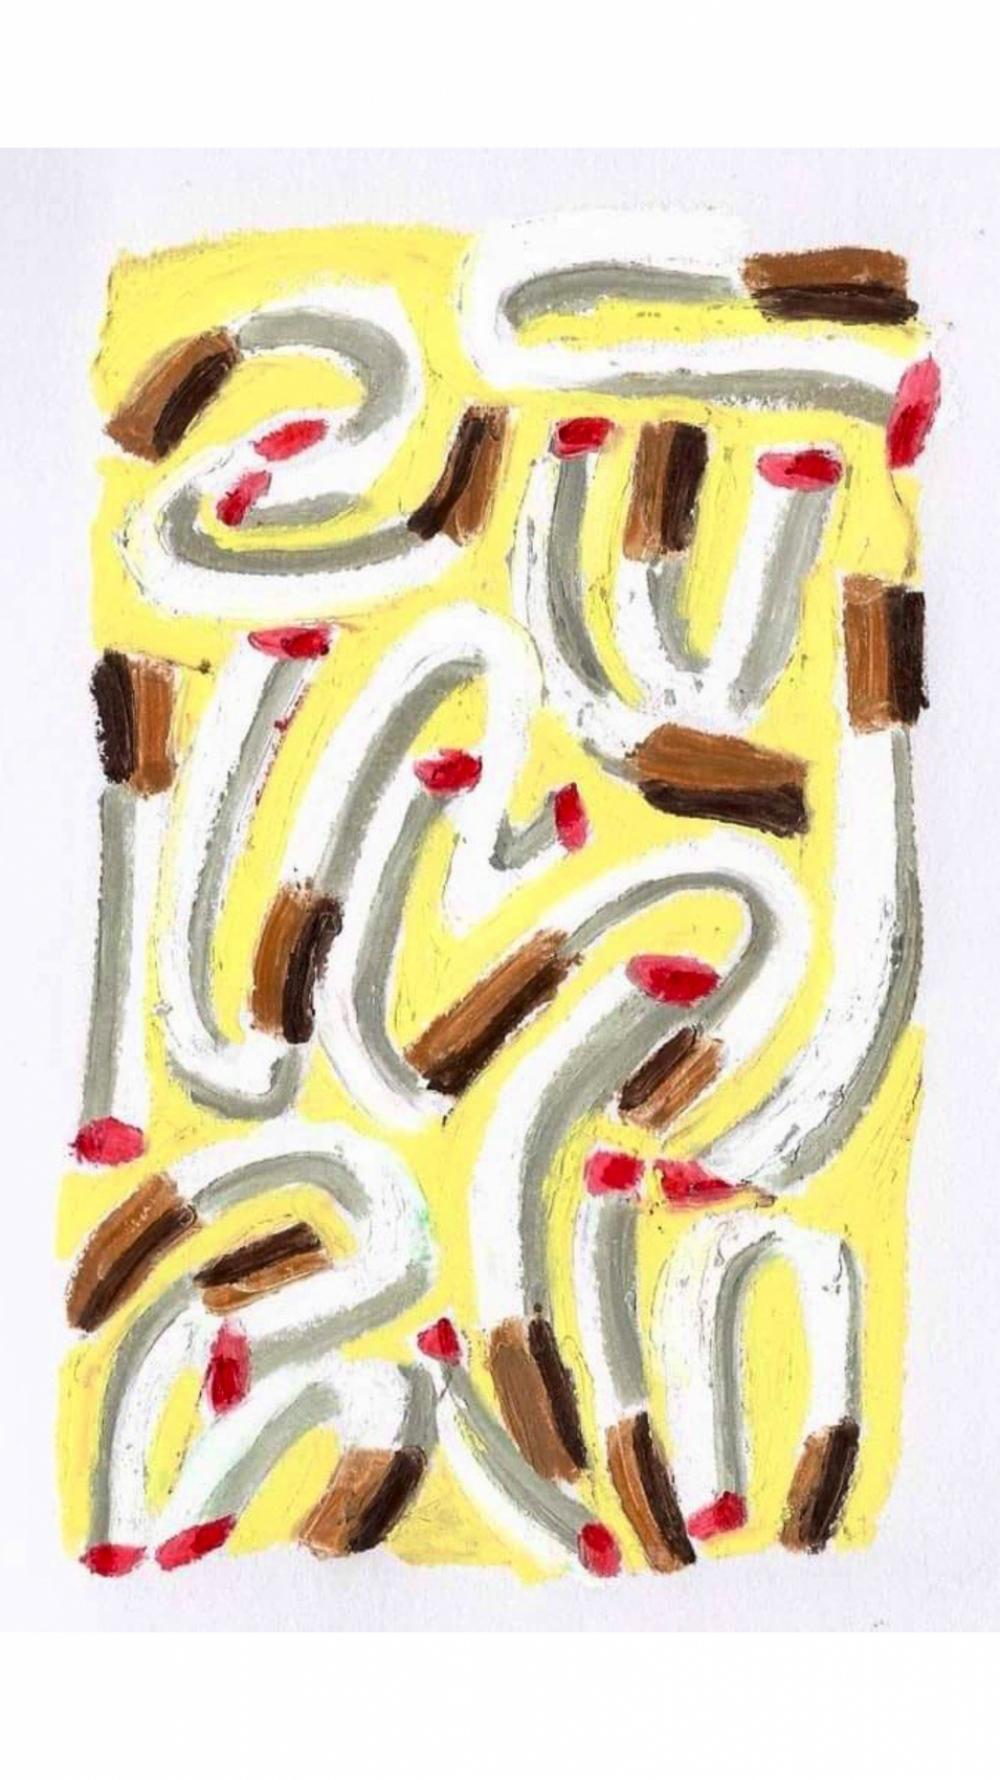 Anna Choutova - Cigarette Snakes 1 Oil Pastel on Paper21 cm x 15 cm